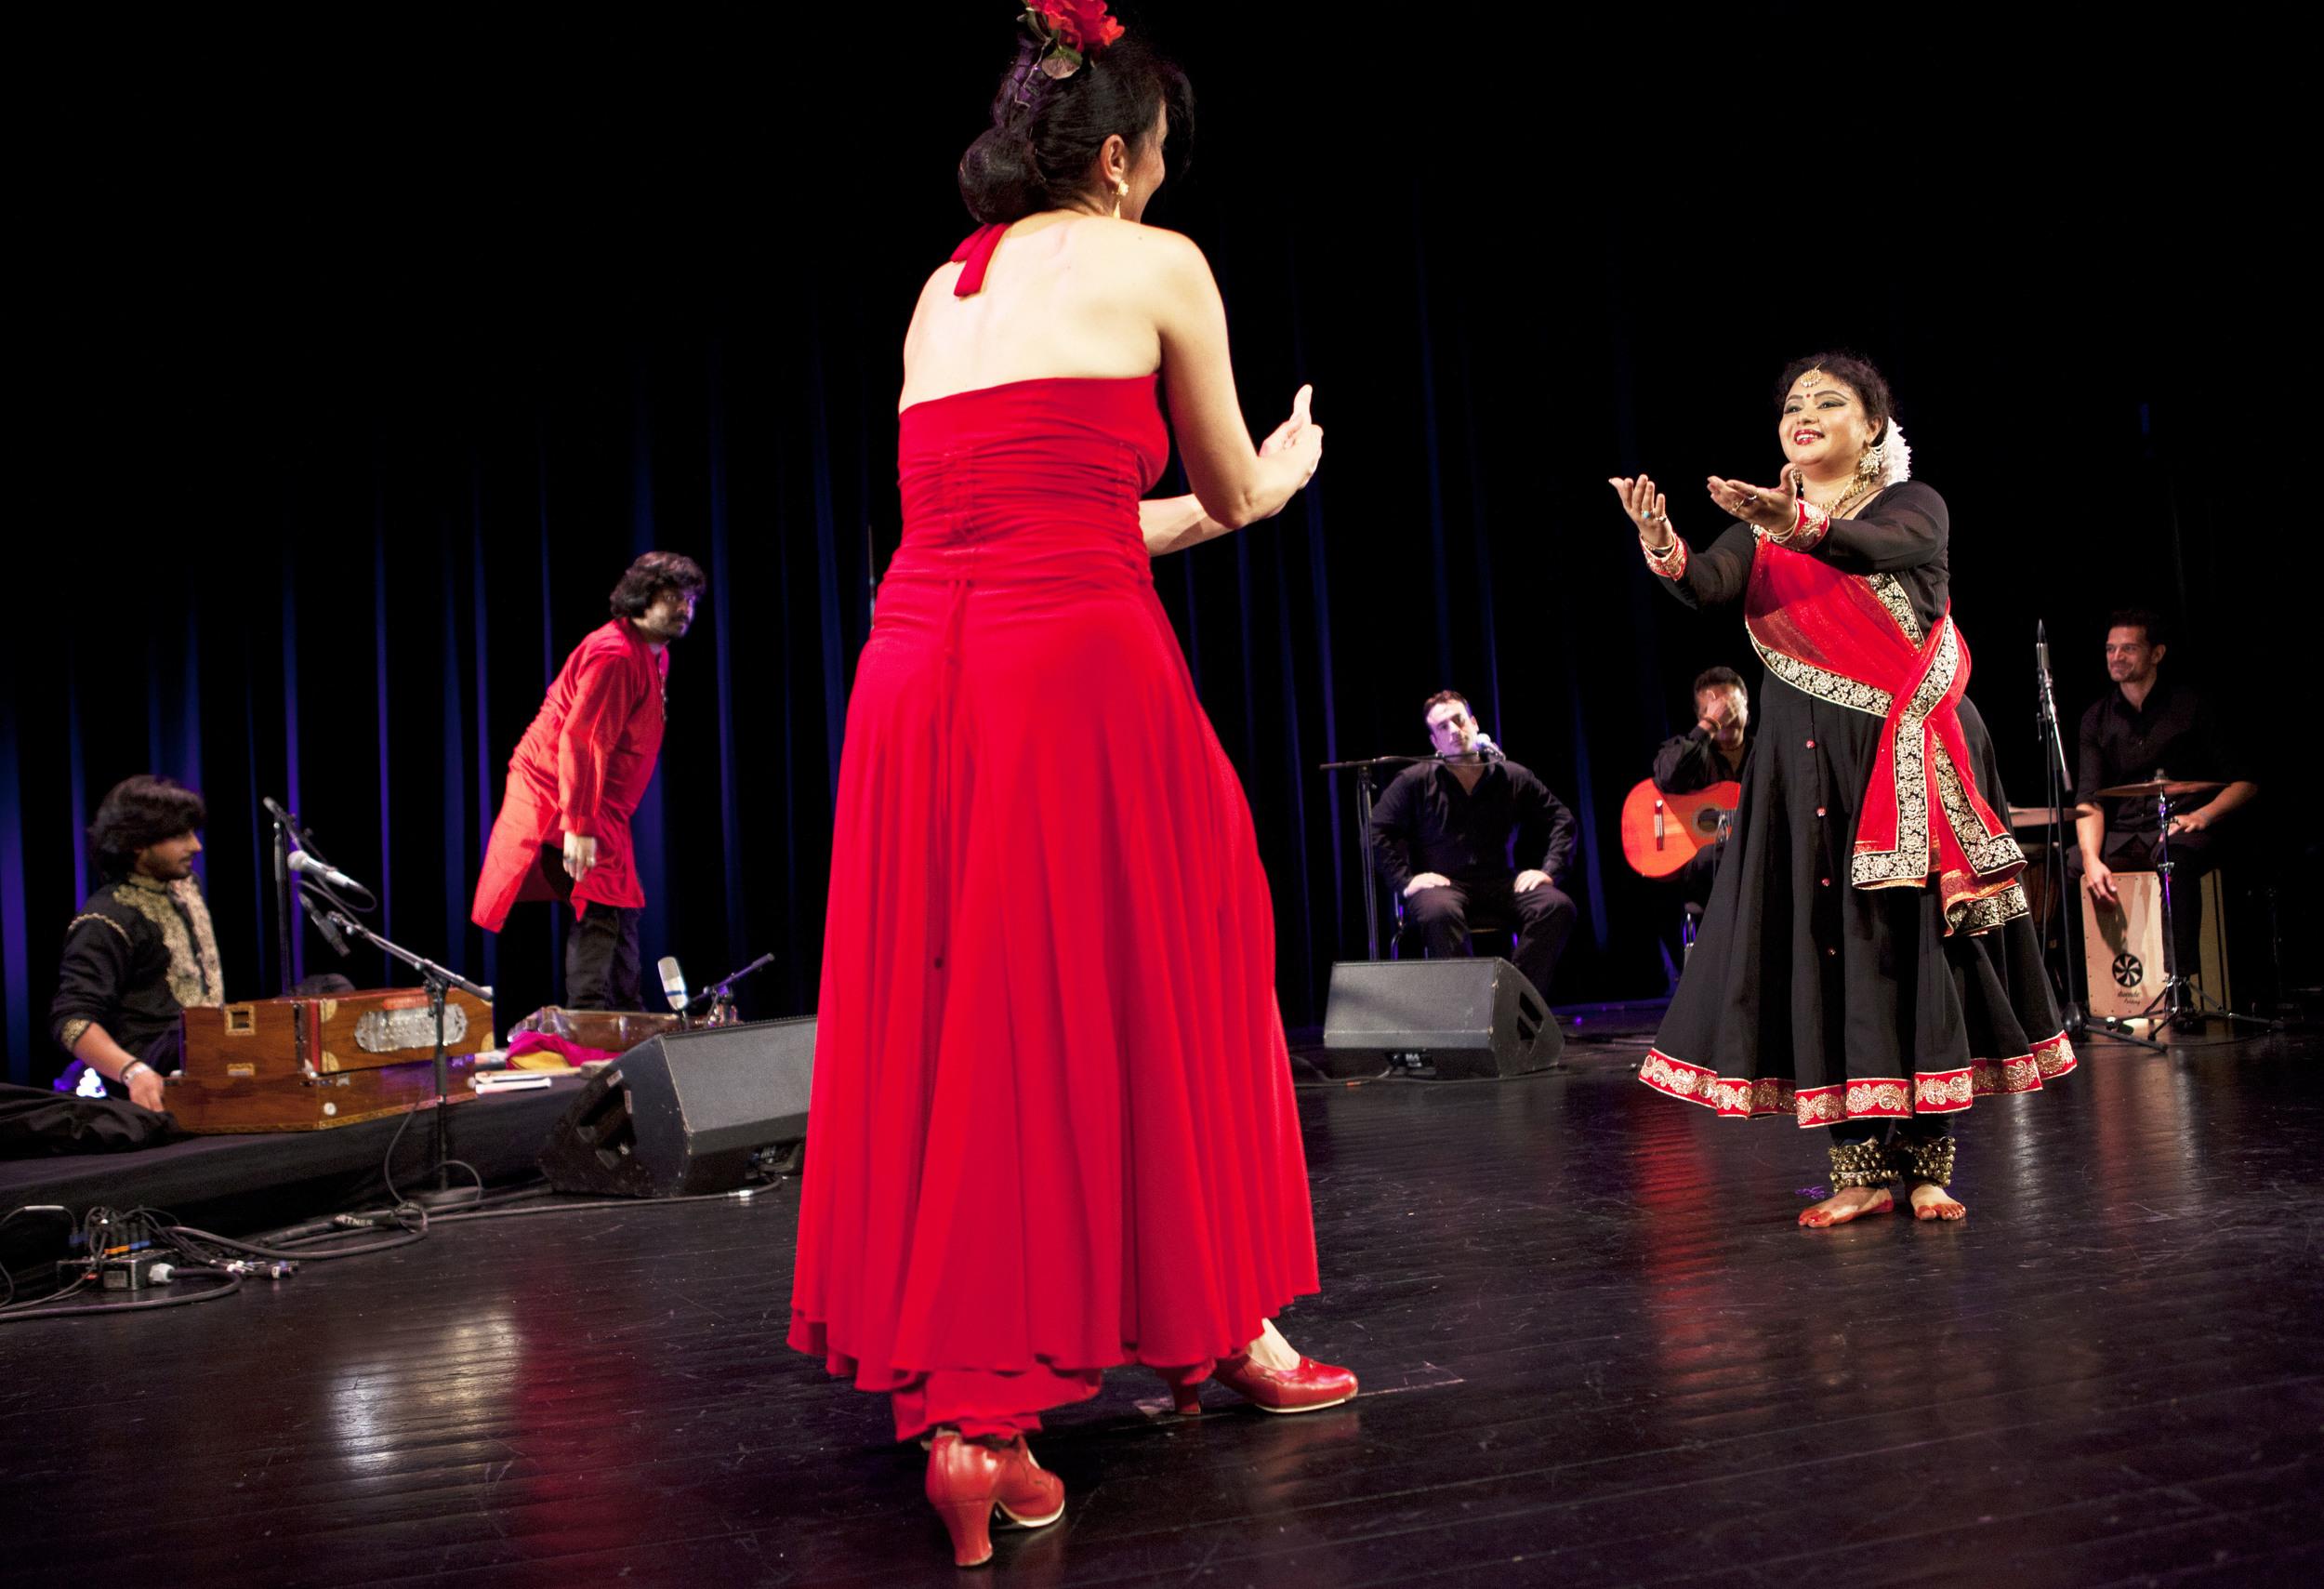 dance connections - pilar astola - teatersalen - 4. juli - heidi hattestein - IMG_5332.jpg